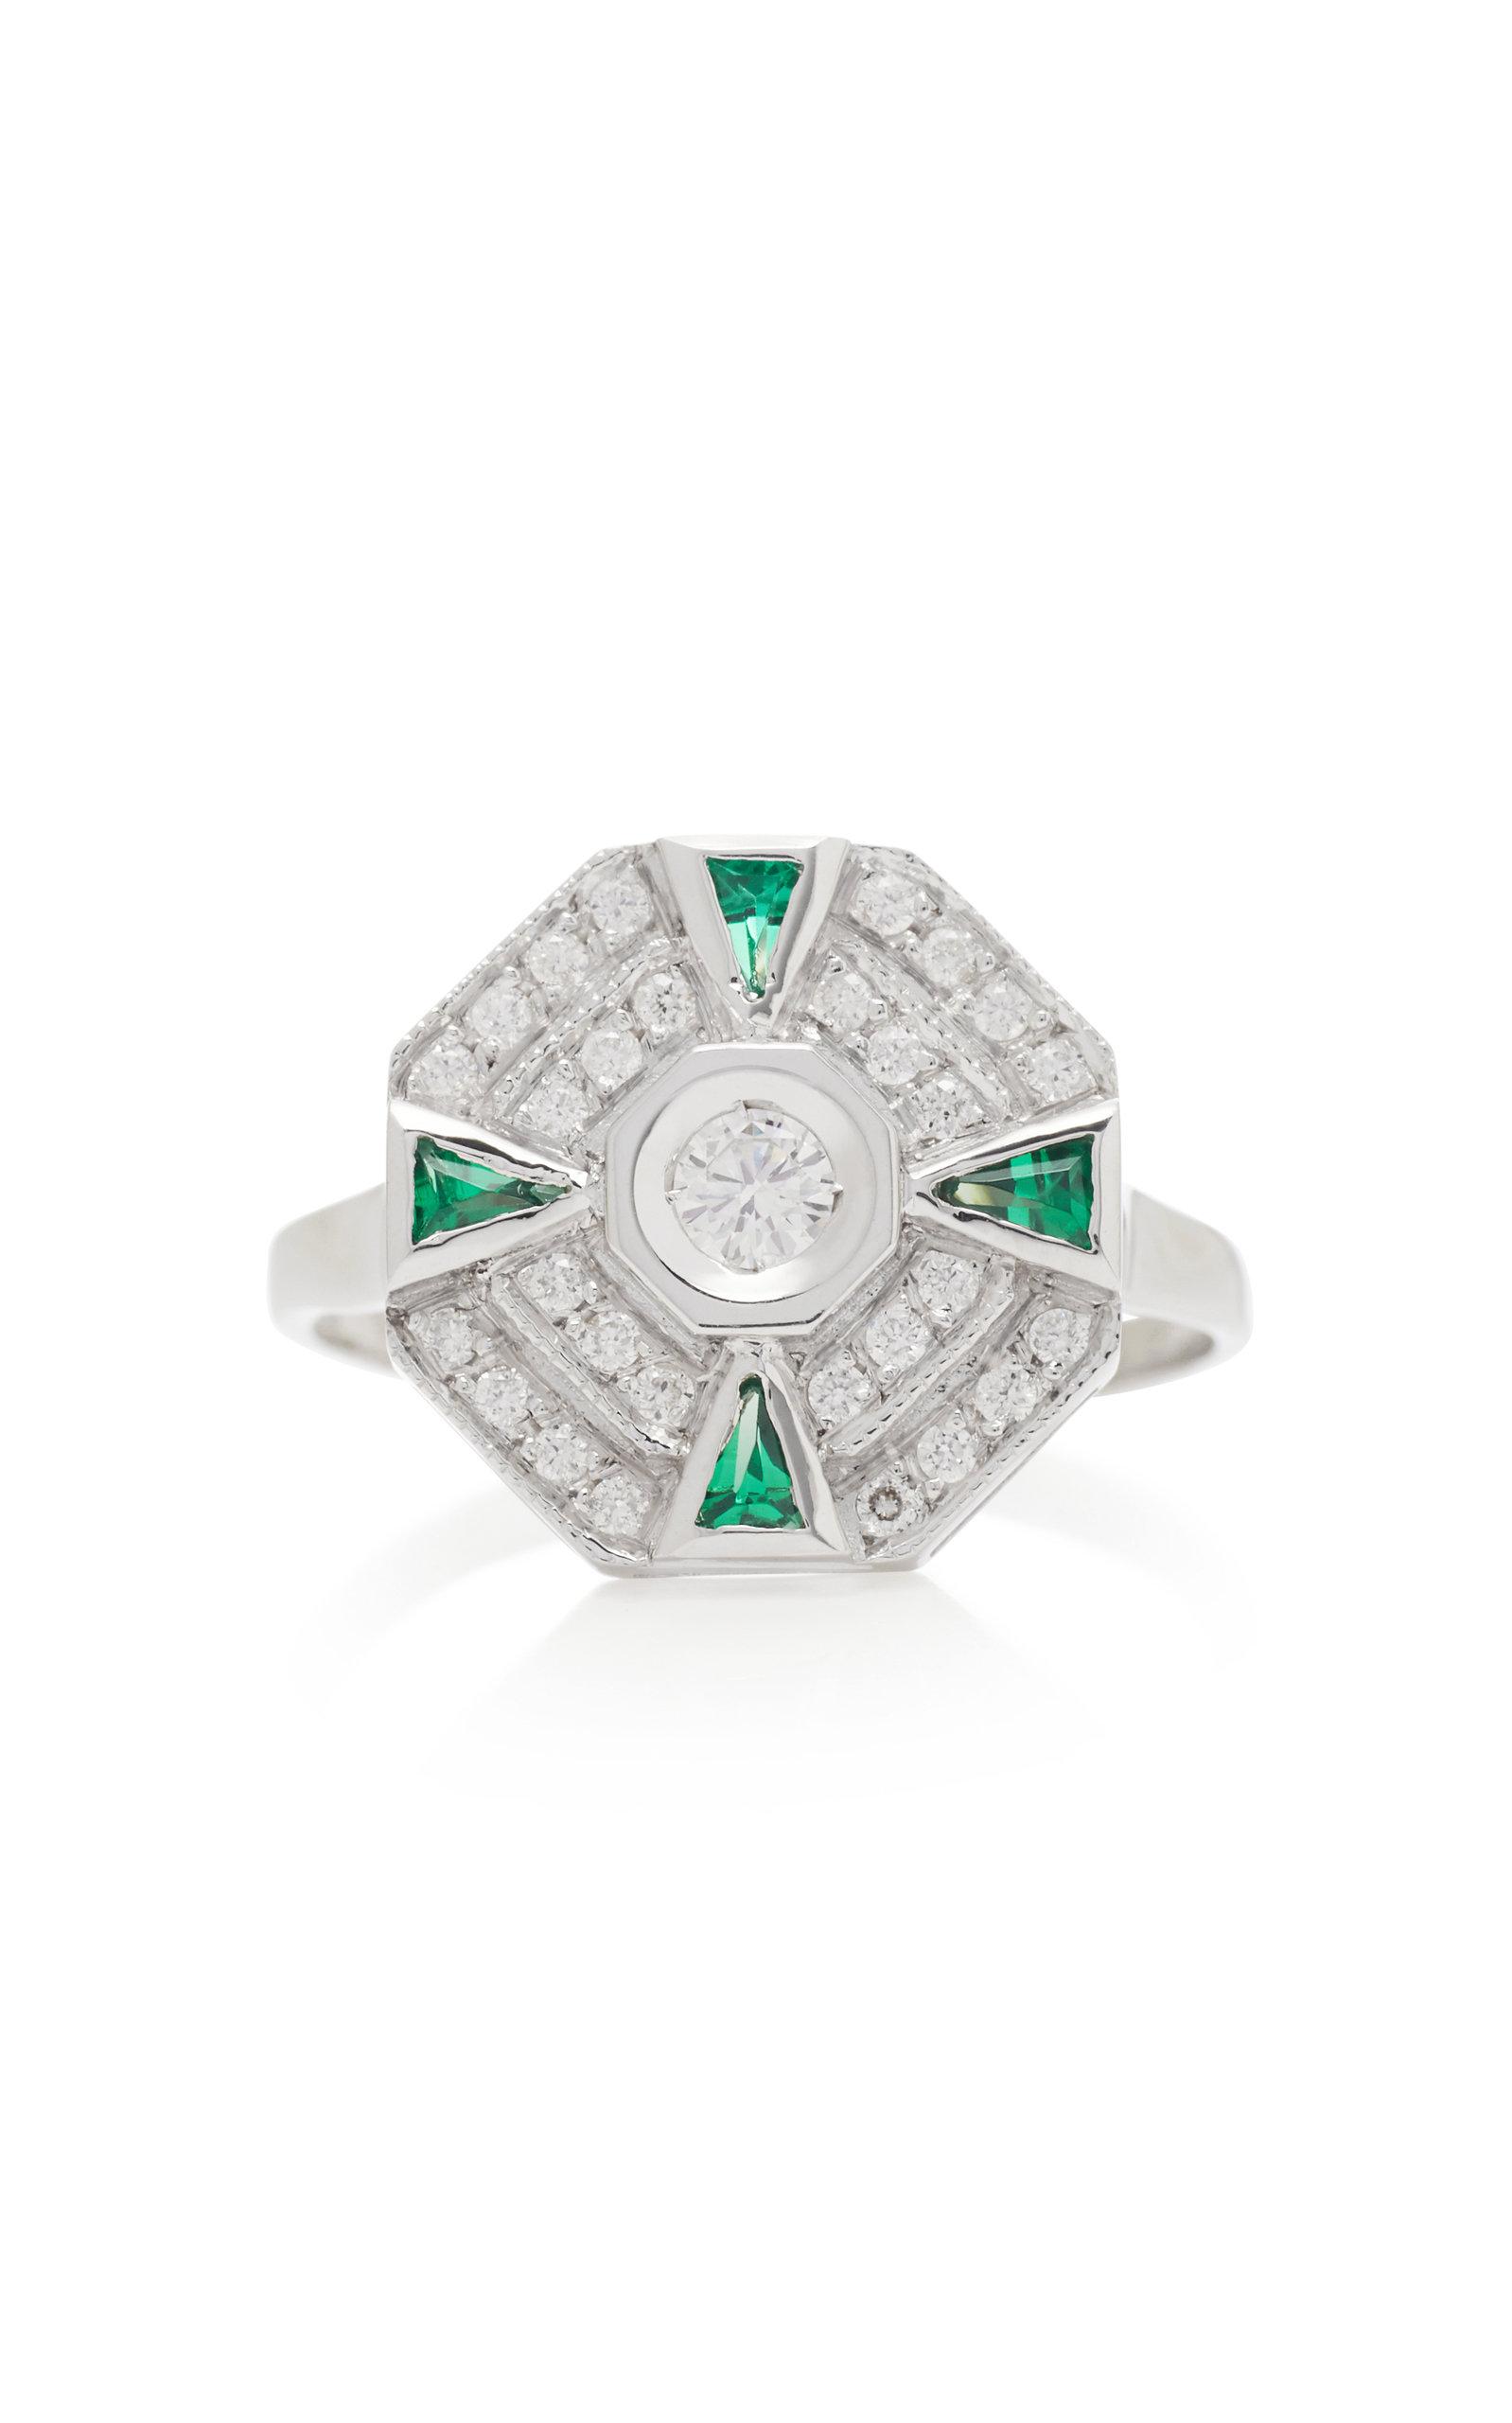 Women's 18K White Gold; Diamond And Tsavorite Ring